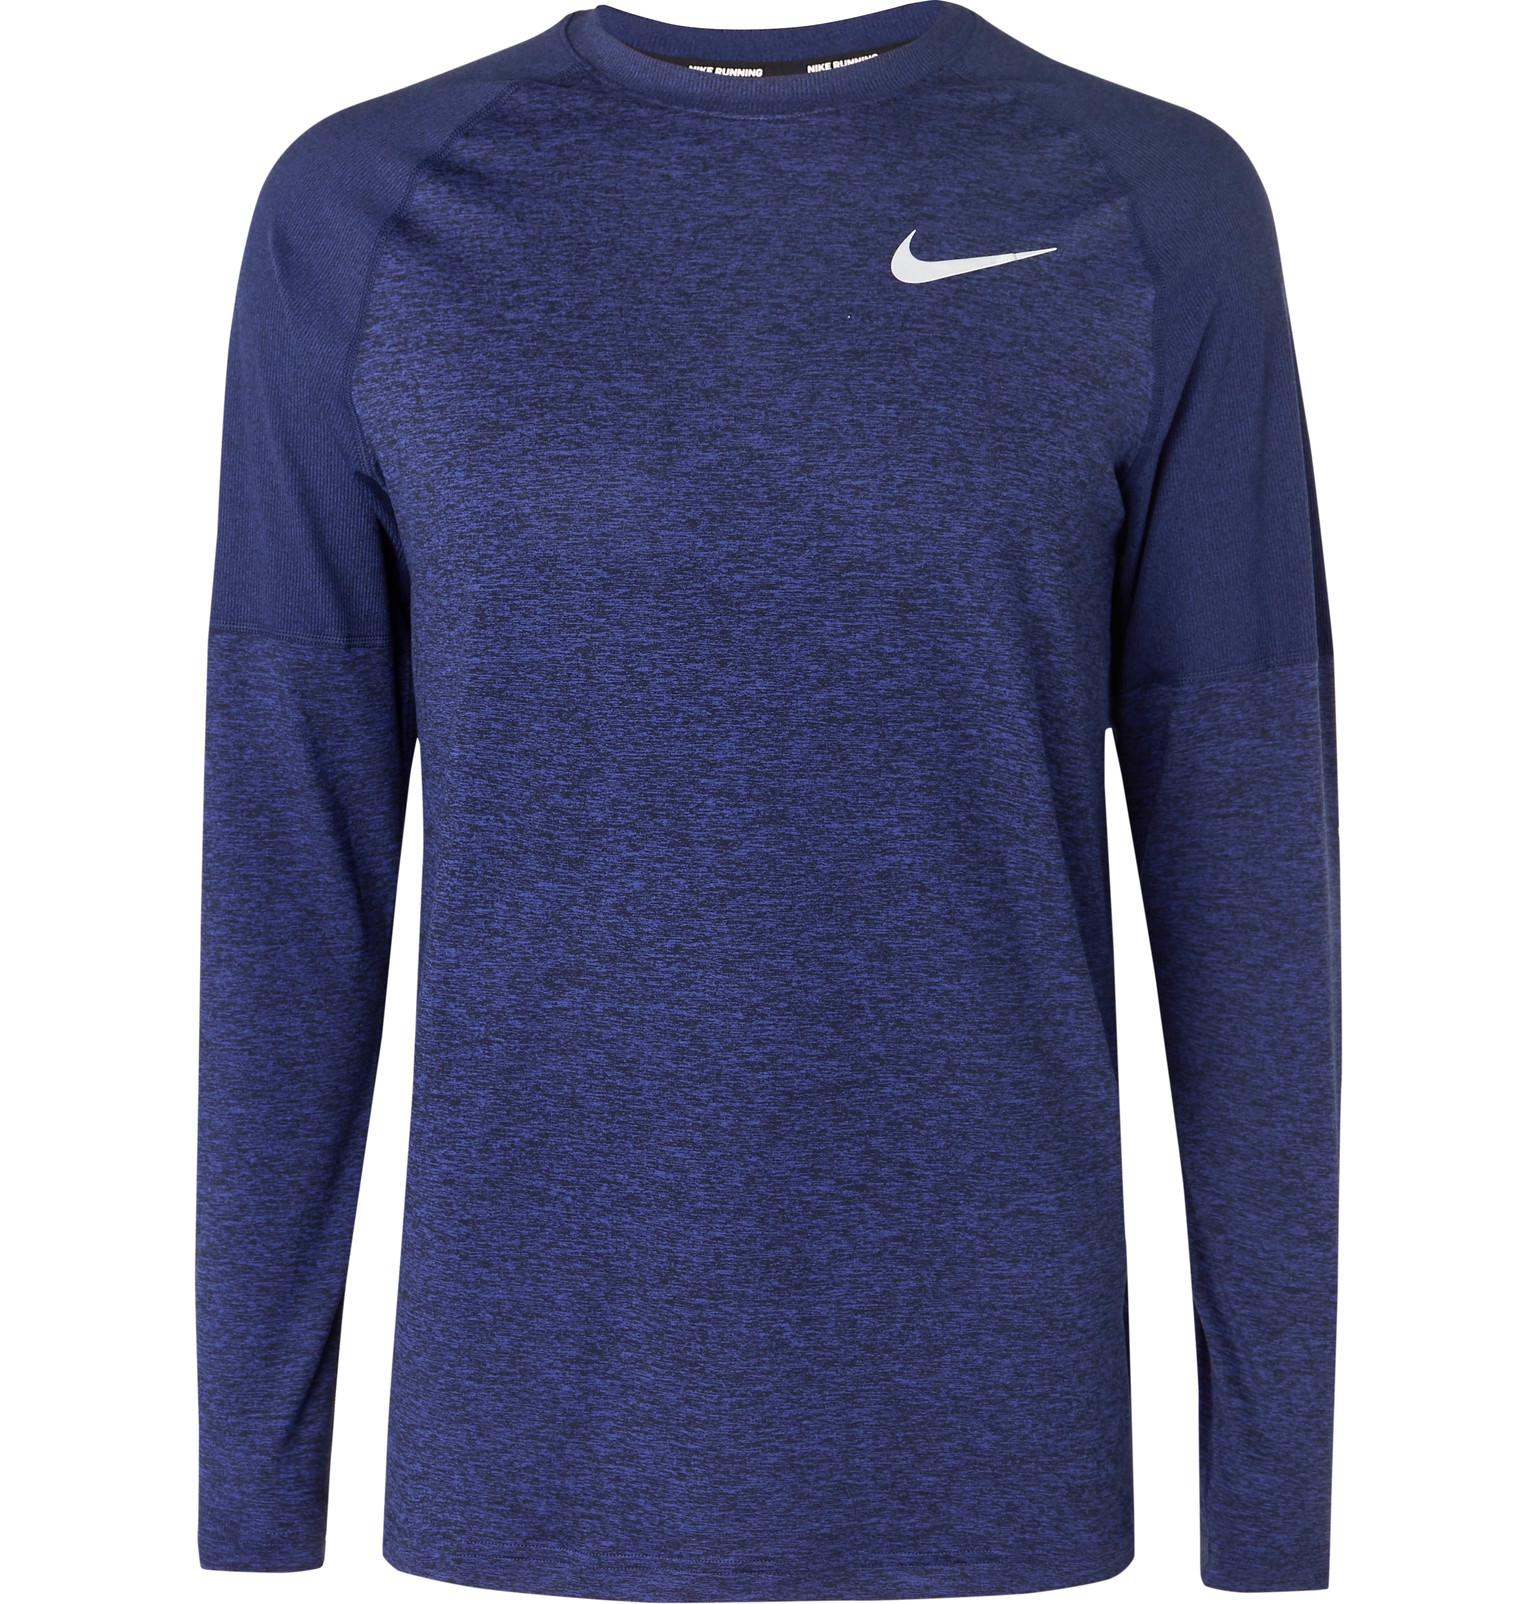 bc530b784f5 Nike Element Mélange Dri-fit T-shirt in Blue for Men - Lyst